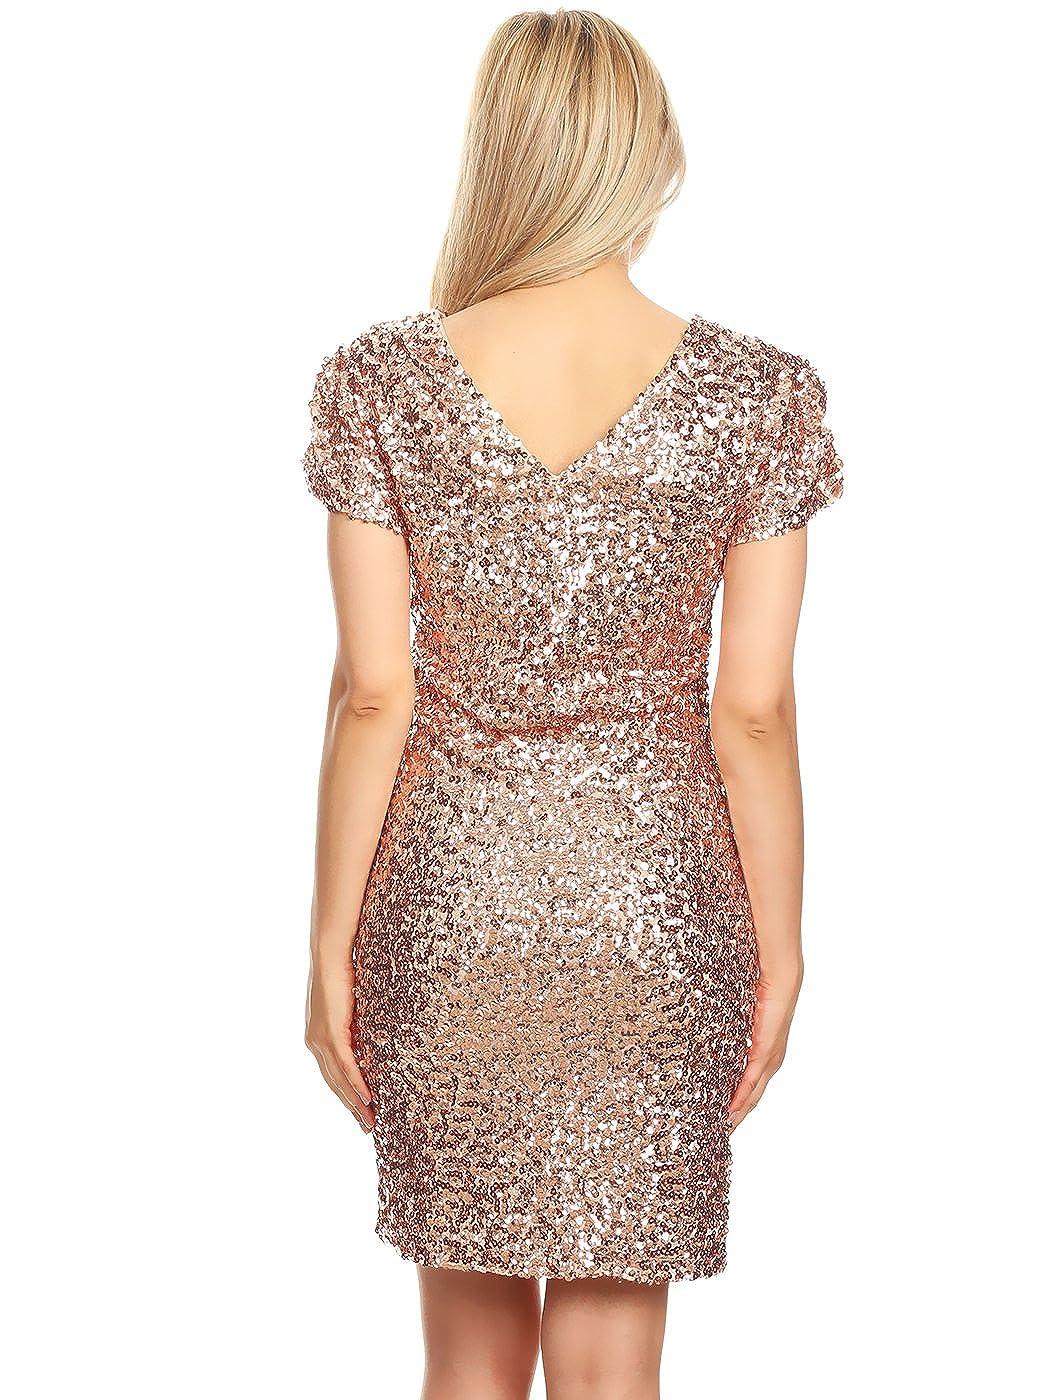 Anna-Kaci Sexy Short Sleeve Sequin Bodycon Mini Cocktail Party Club Dress: Amazon.co.uk: Clothing